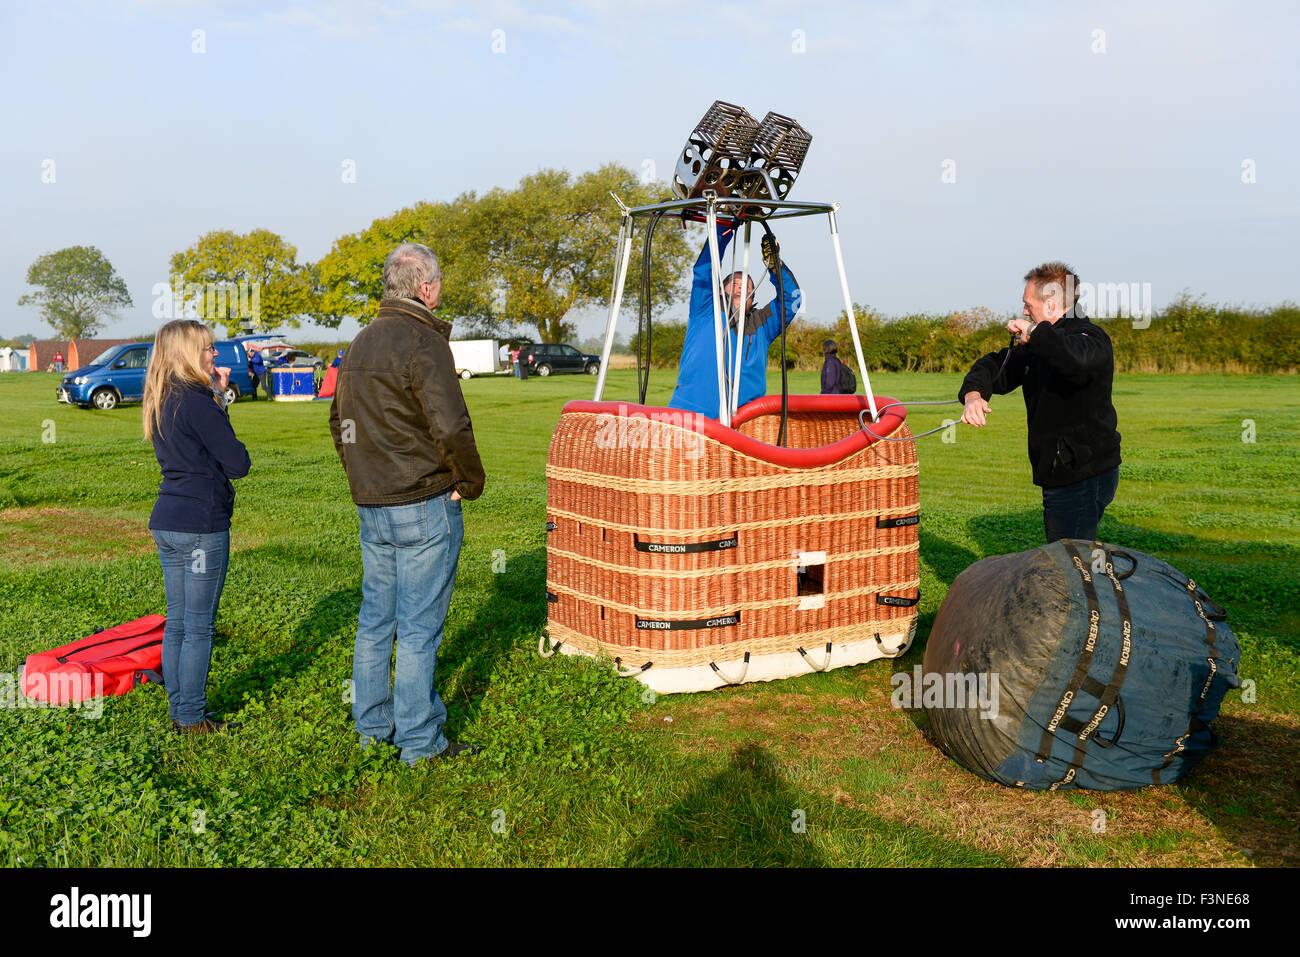 Thornton Dale, North Yorkshire, UK. 10th Oct, 2015. Saturday 10th, October 2015. Pilot Duncan Lambert prepares the - Stock Image